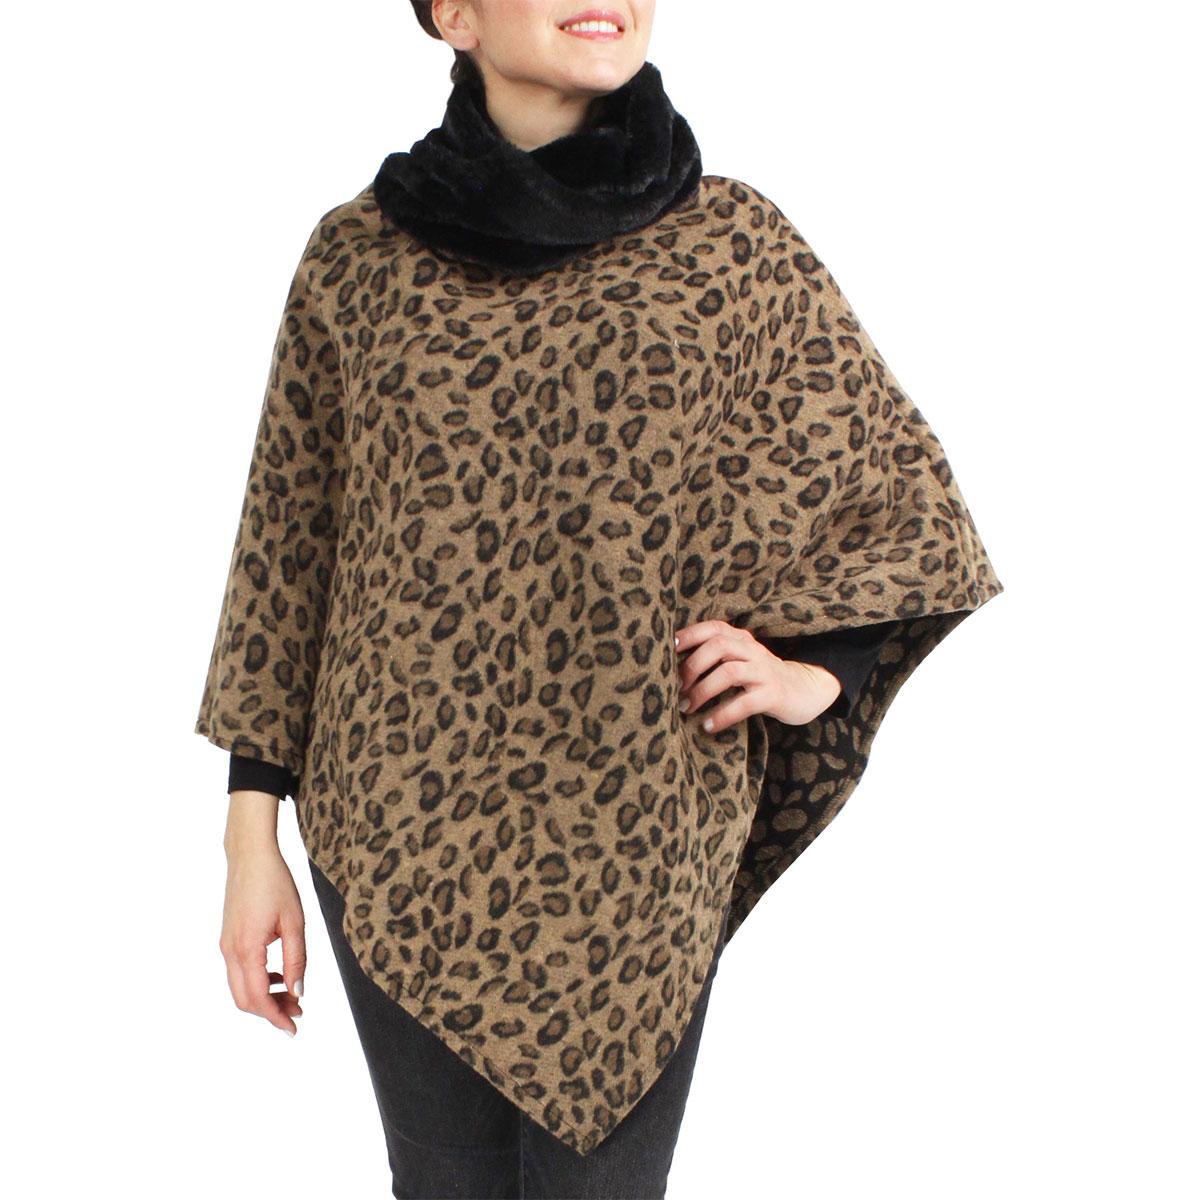 Winter Ponchos - Faux Fur Designs - Animal w/ Fur Collar 9396 Leopad Print Taupe